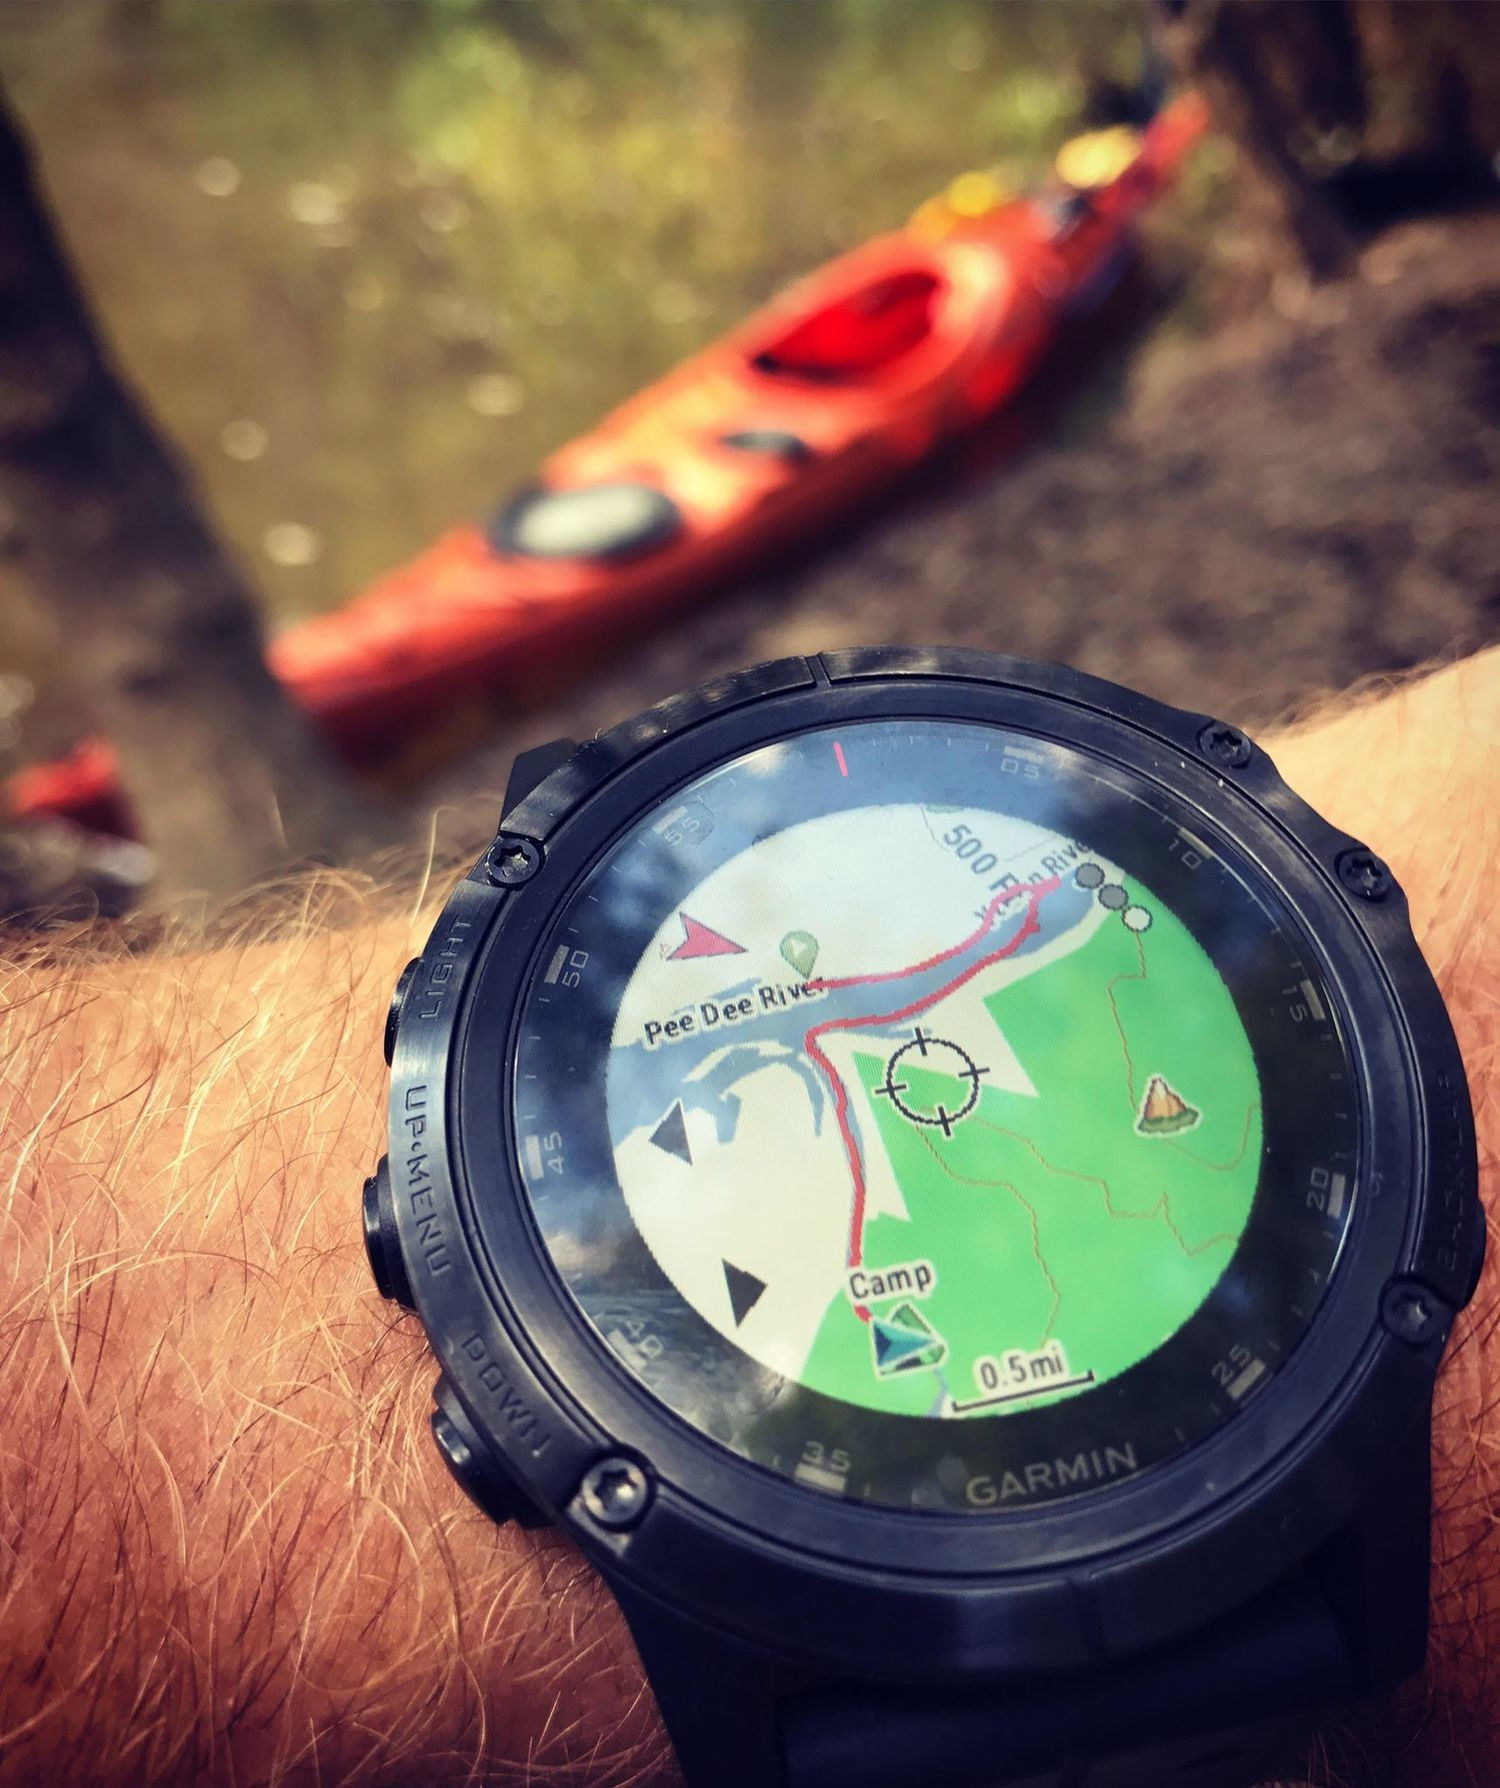 The Garmin Fenix 5X Plus is on a test run kayak trip.